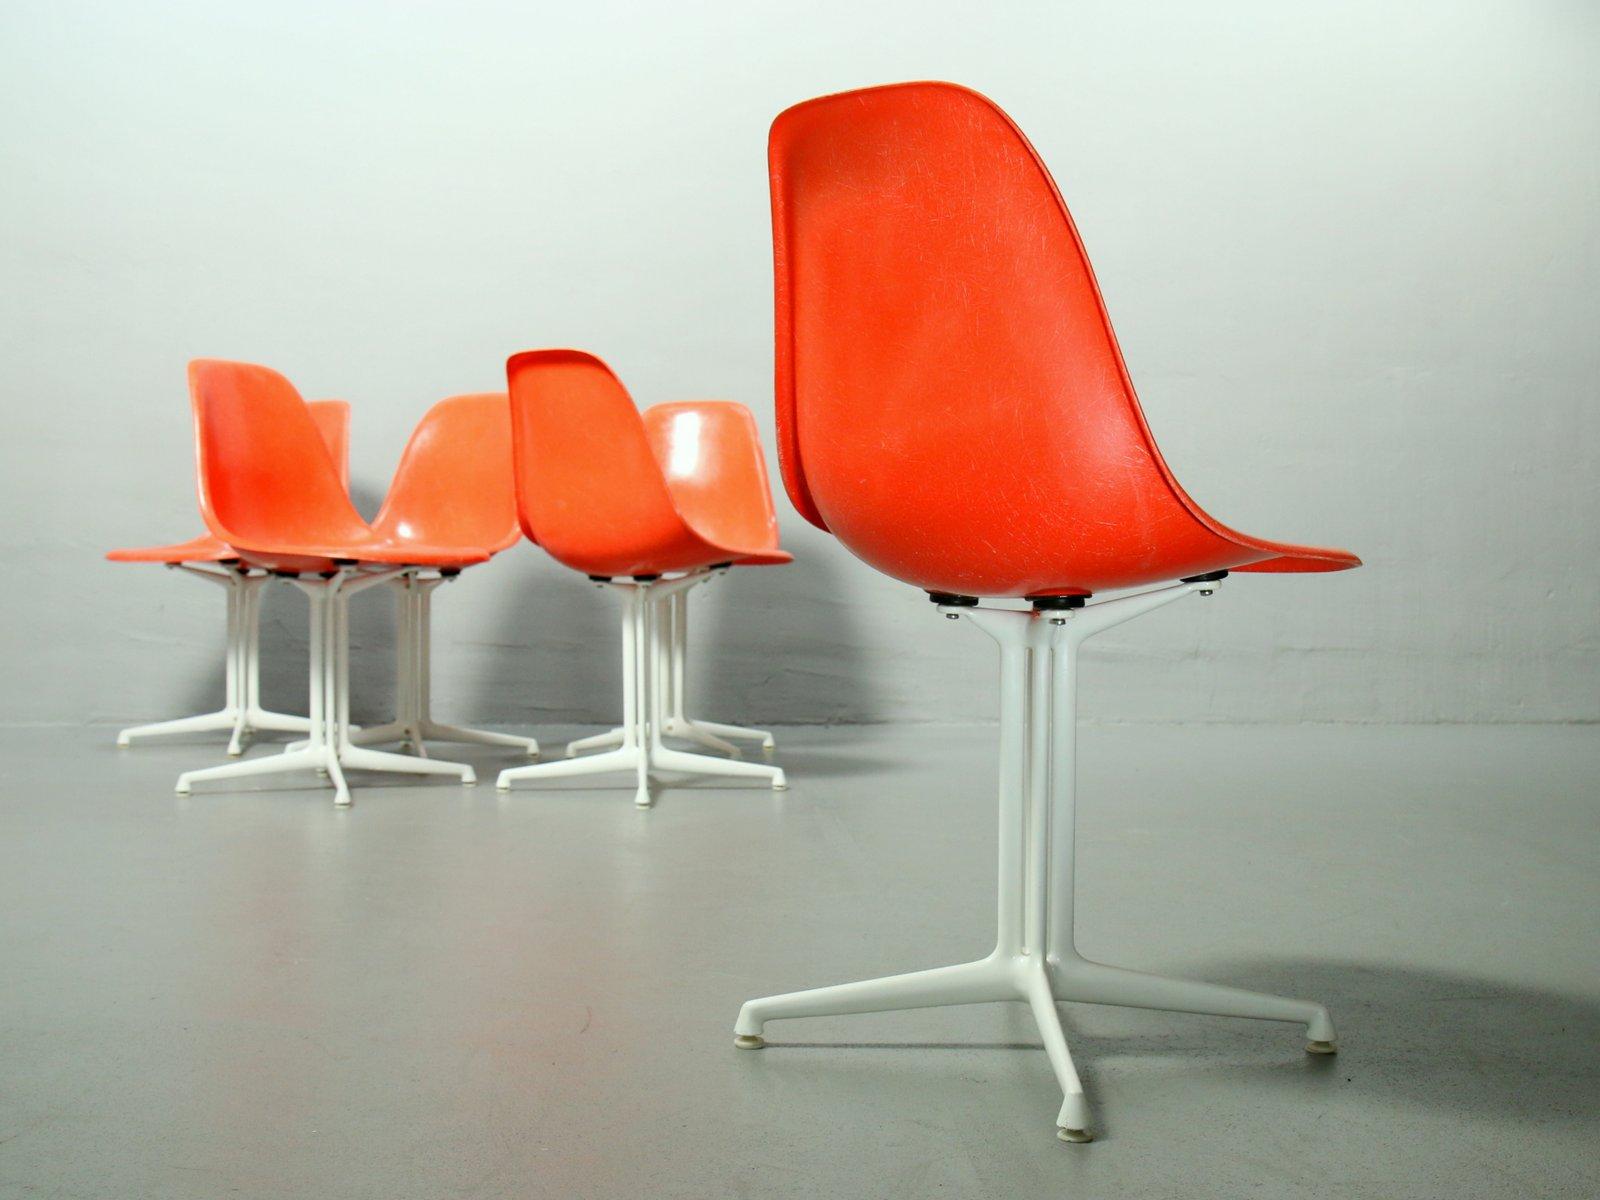 la fonda st hle von charles ray eames f r vitra 1950er 4er set bei pamono kaufen. Black Bedroom Furniture Sets. Home Design Ideas